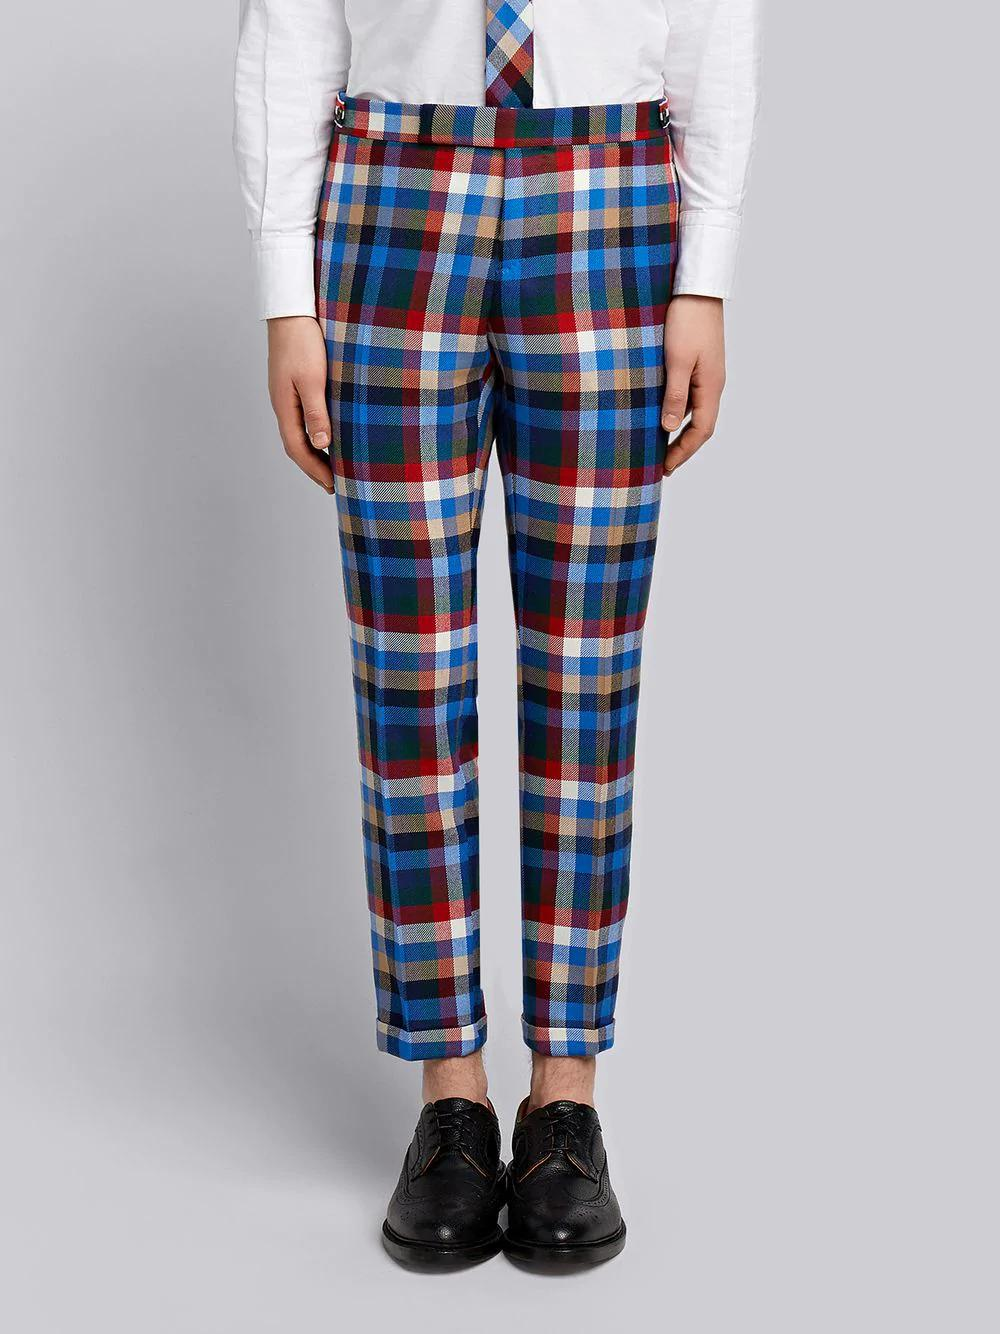 Thom Browne Gingham Tartan Twill Skinny Trousers In Multicolour